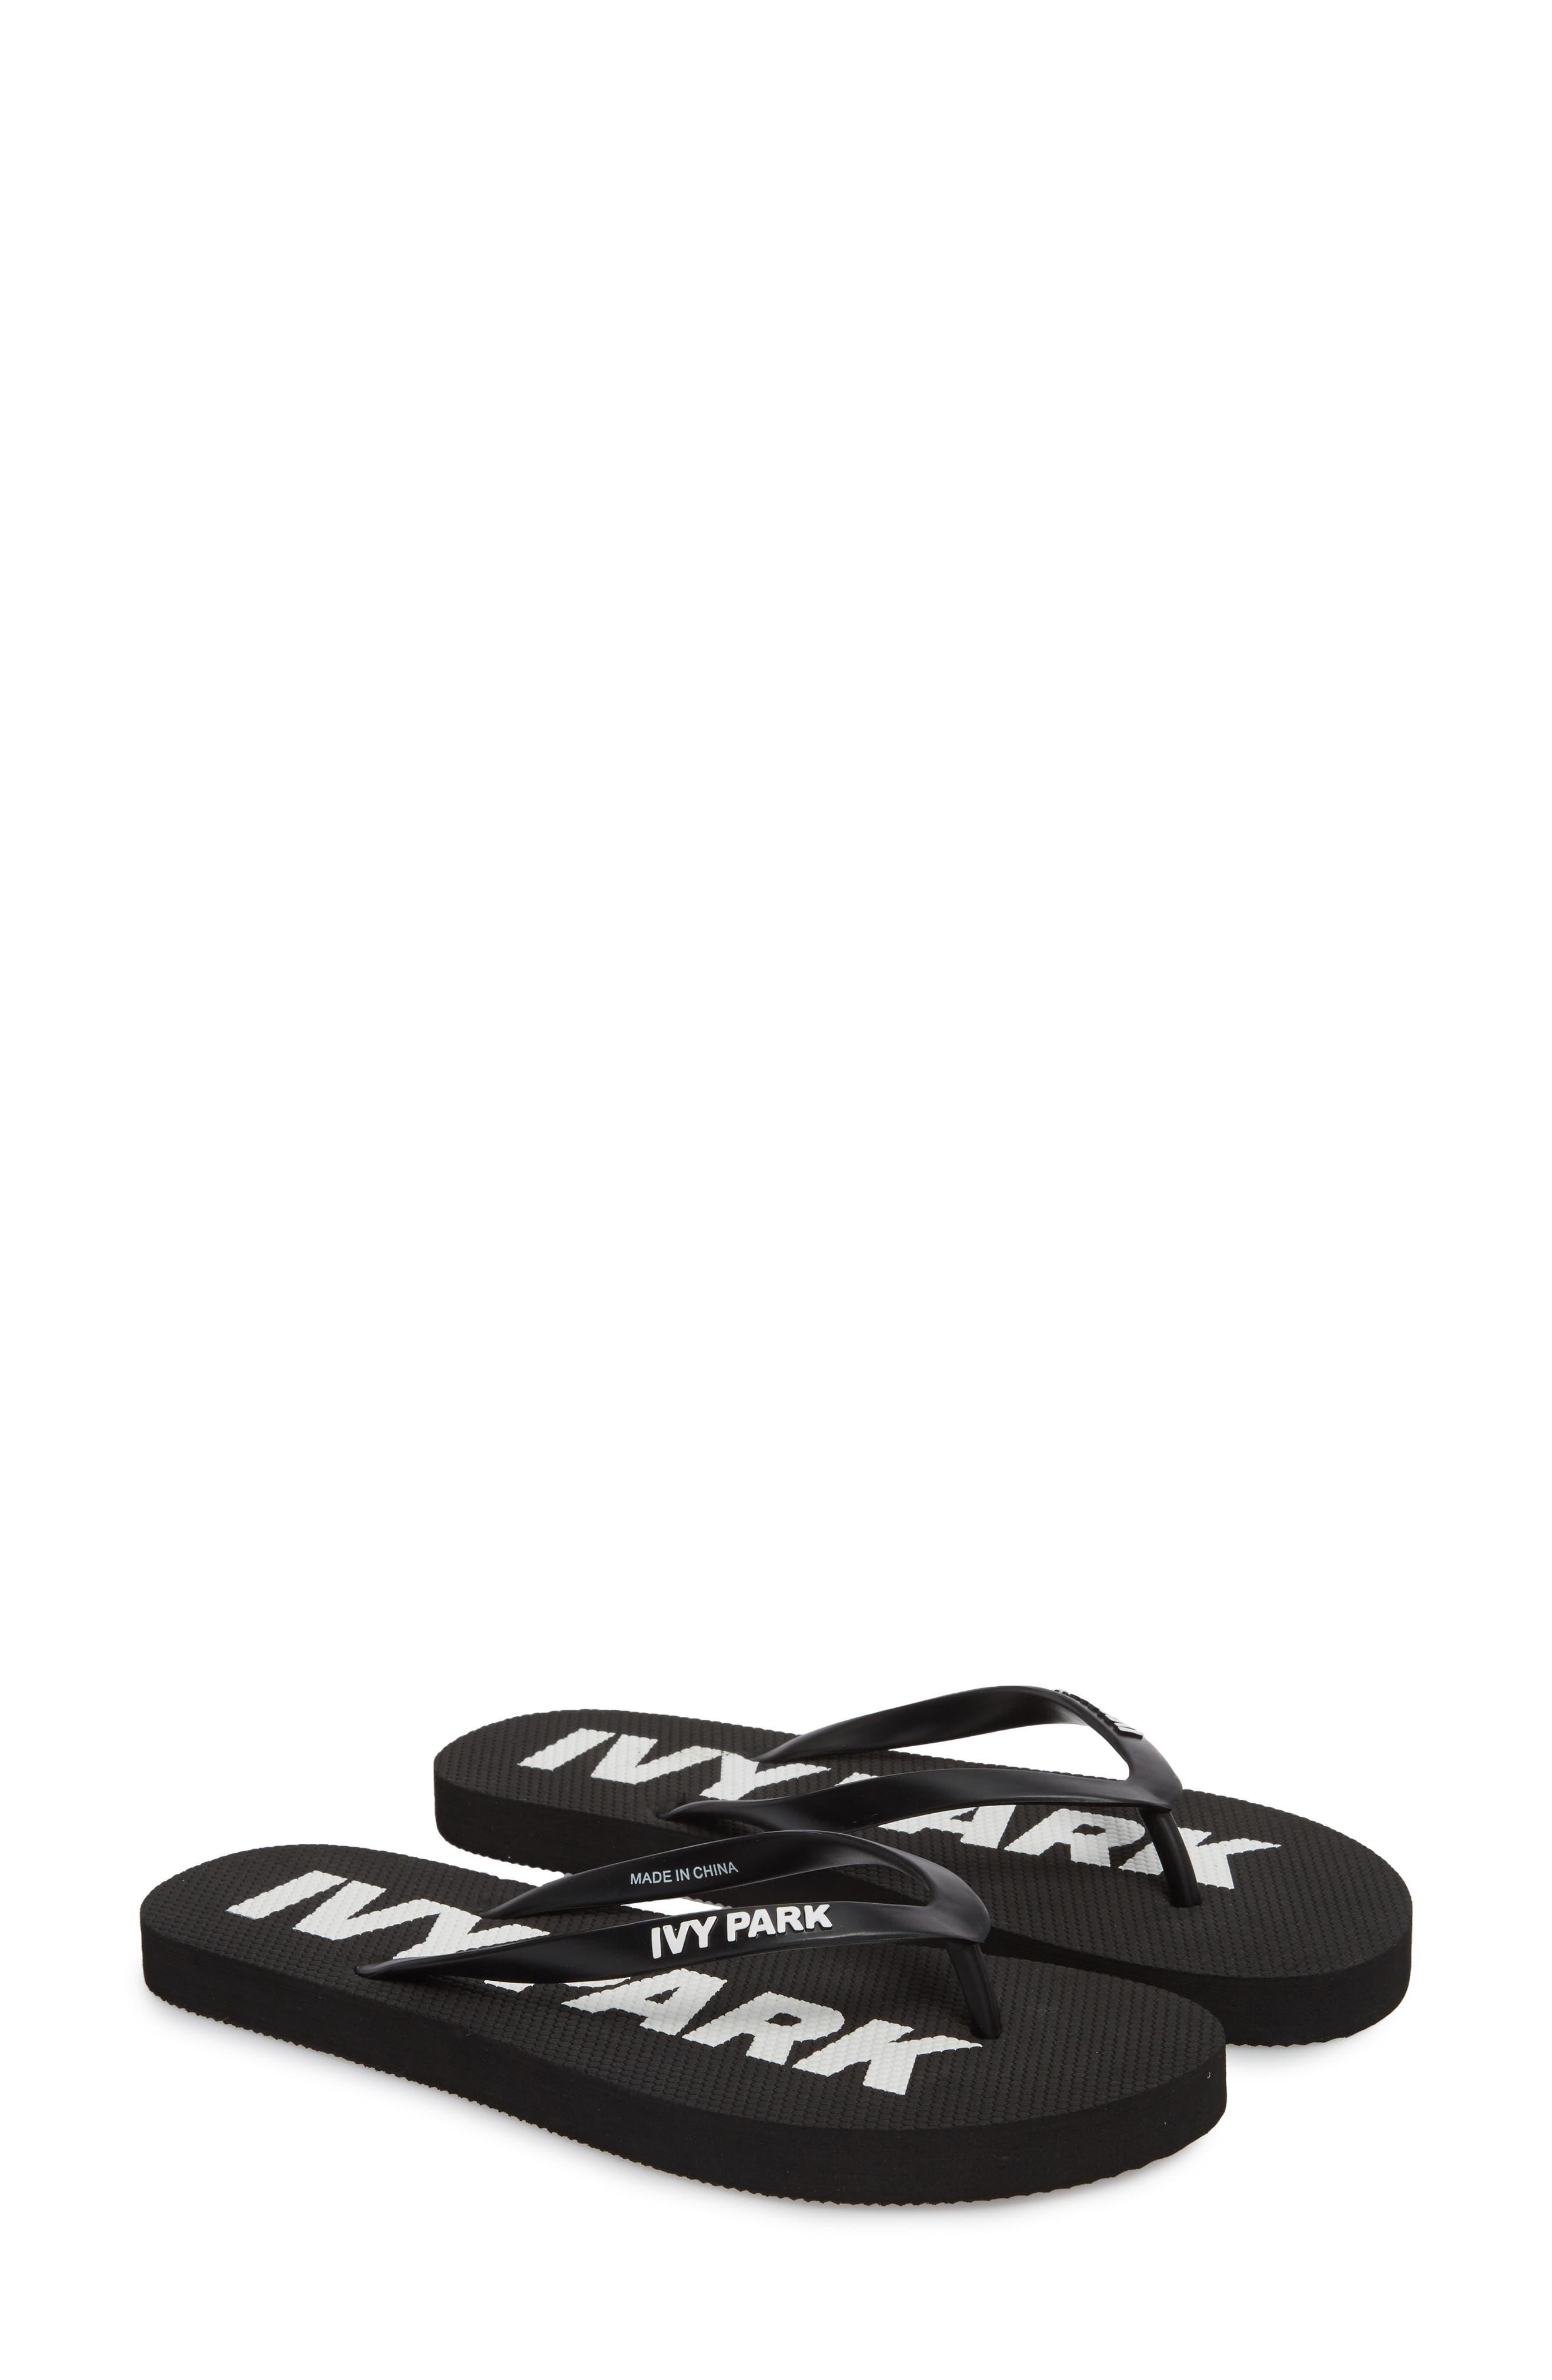 IVY PARK® Logo Flip Flop (Women)